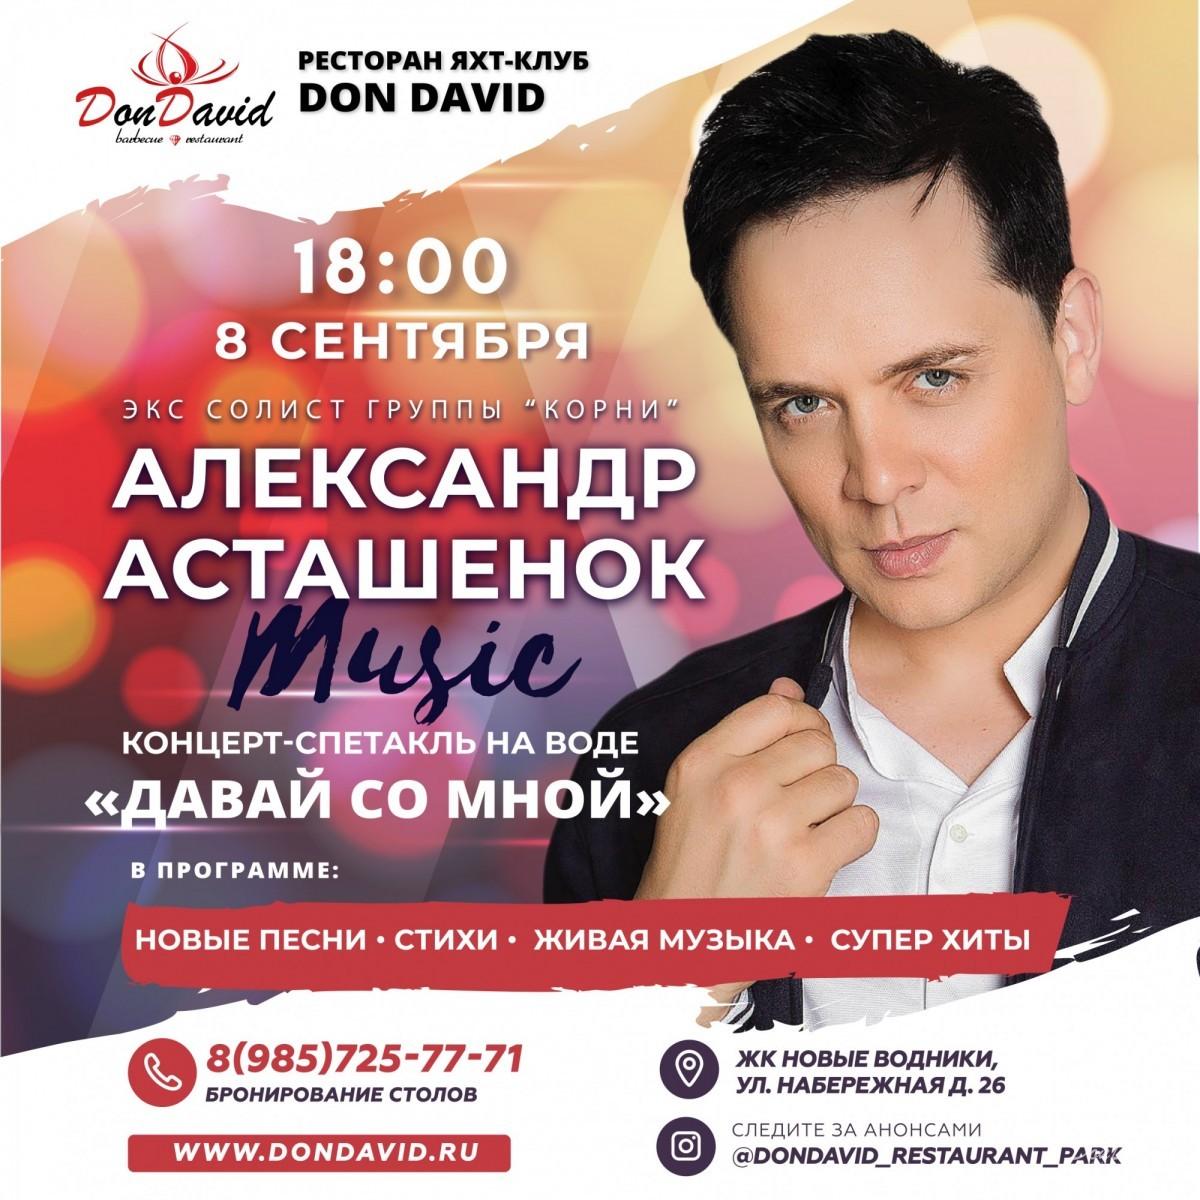 Александр Асташенок с концертом «Давай со мной»